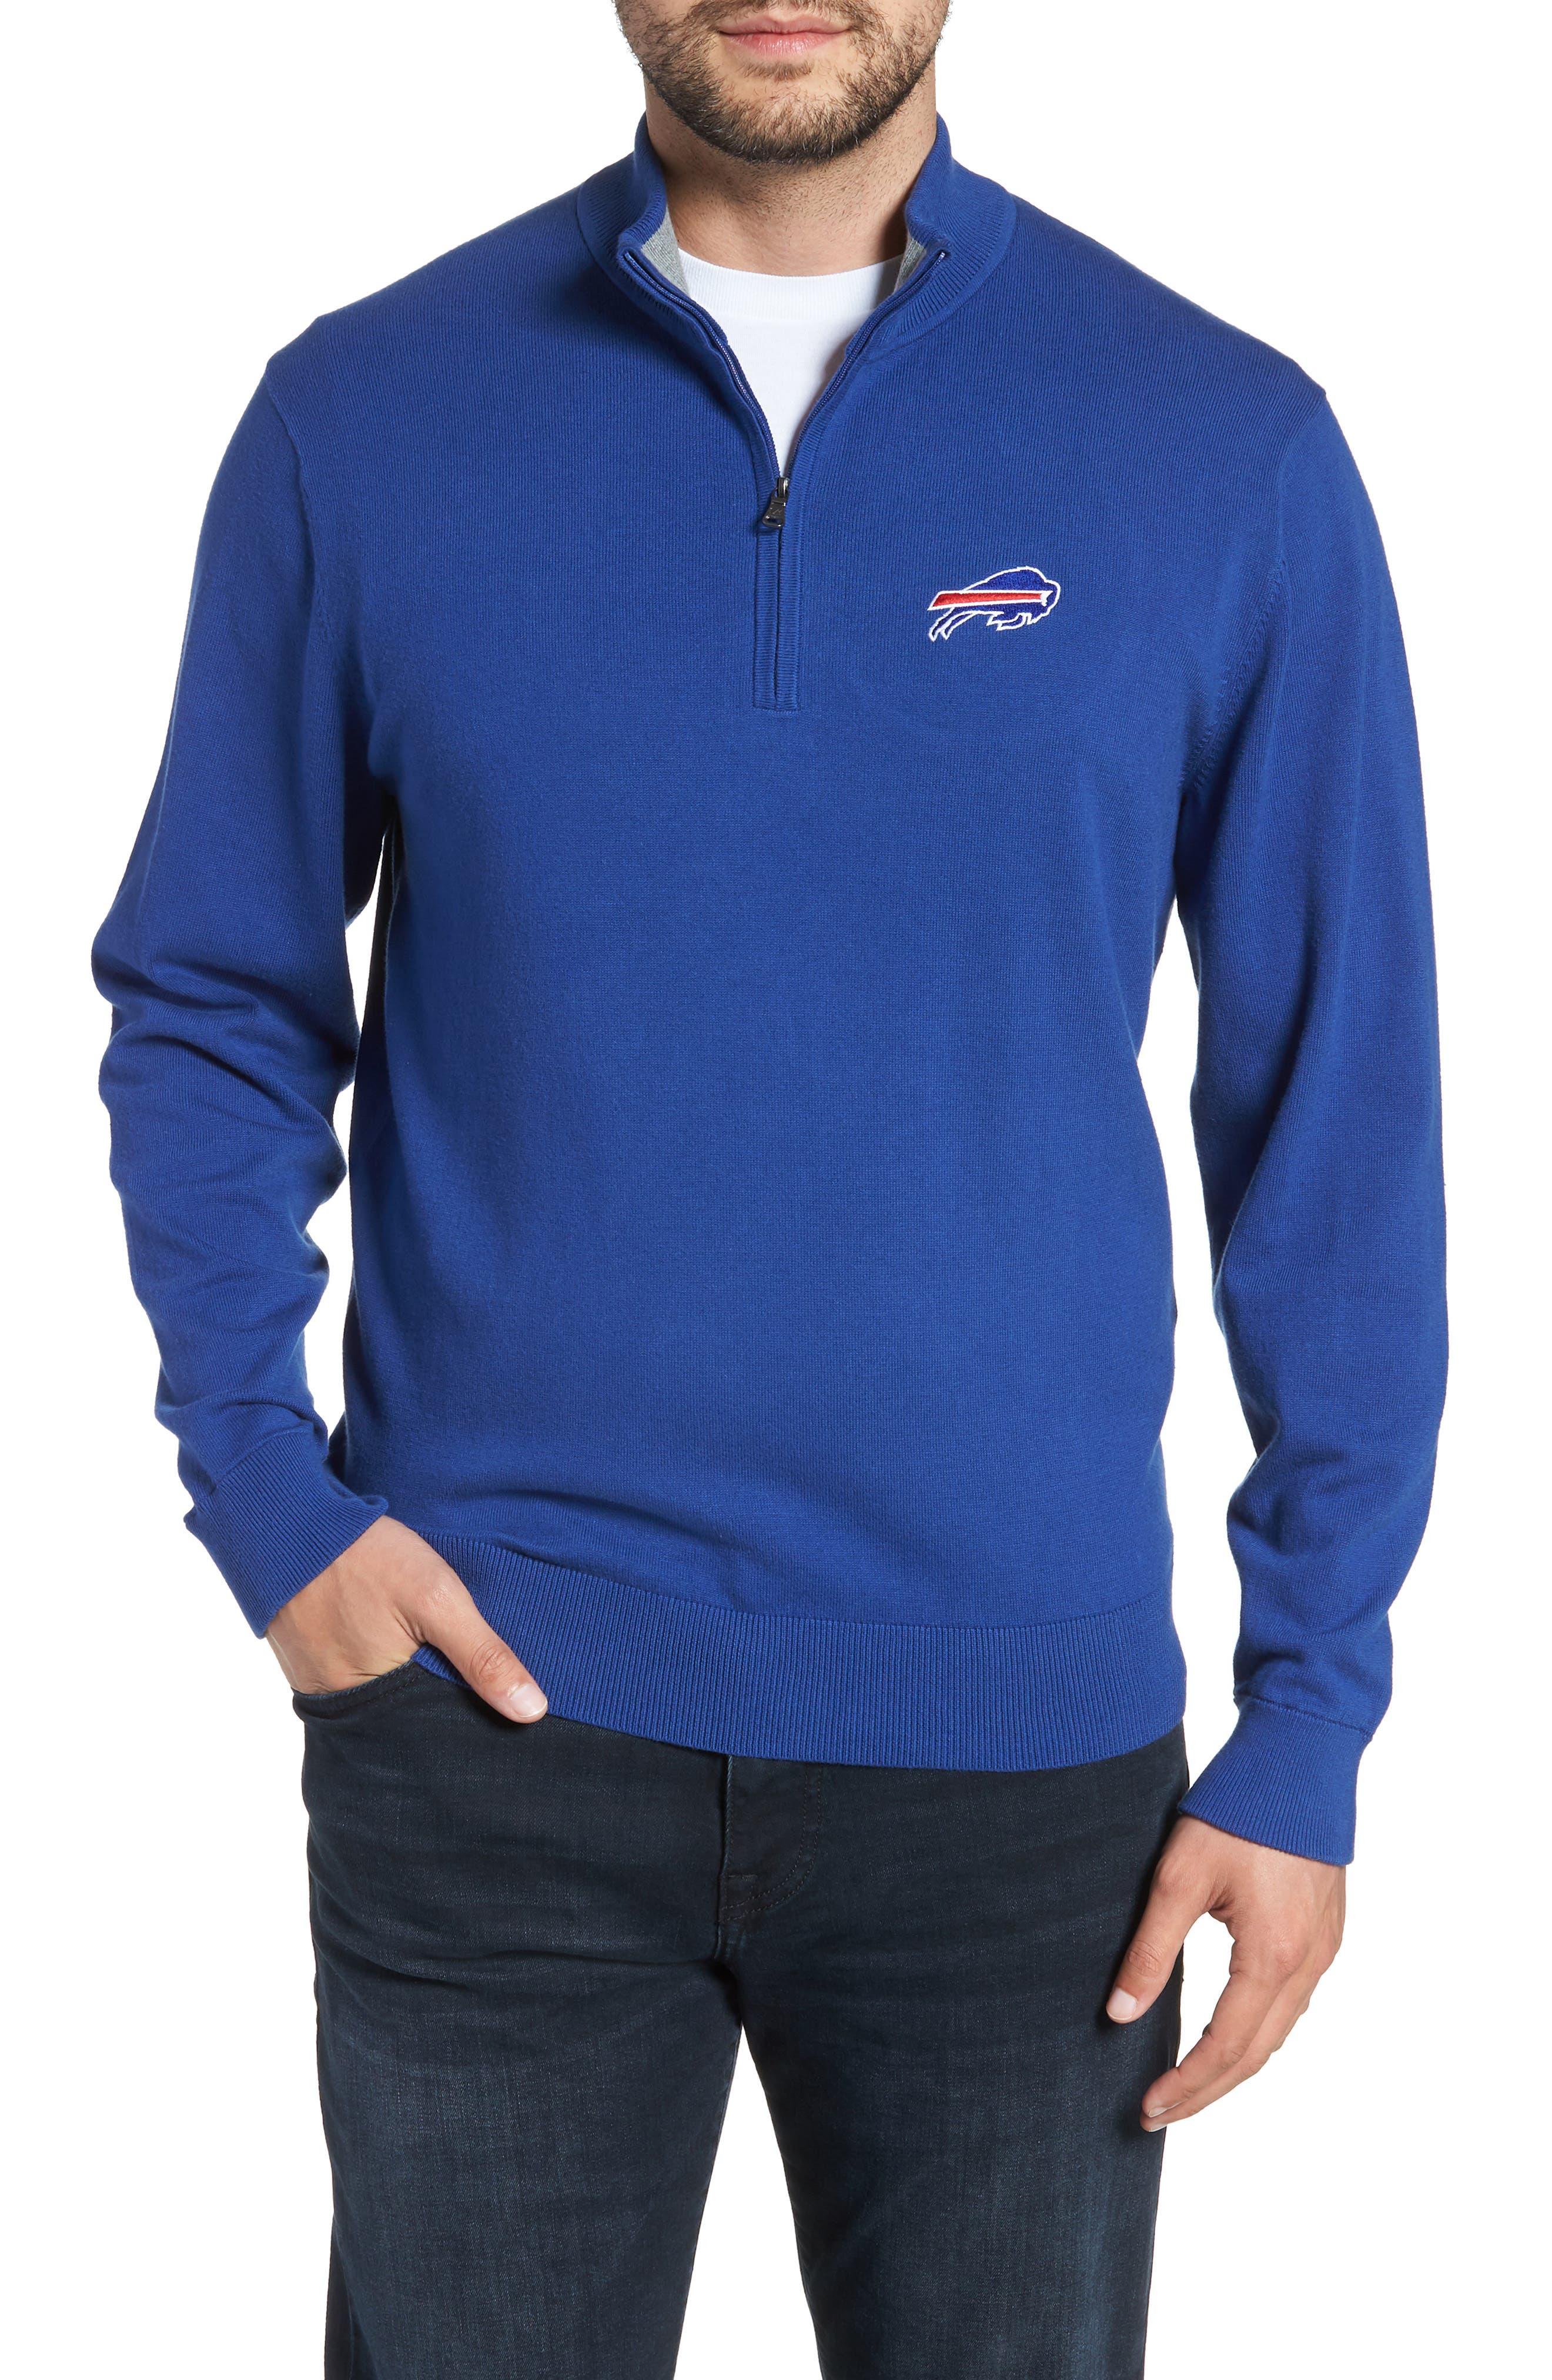 Buffalo Bills - Lakemont Regular Fit Quarter Zip Sweater,                             Main thumbnail 1, color,                             TOUR BLUE